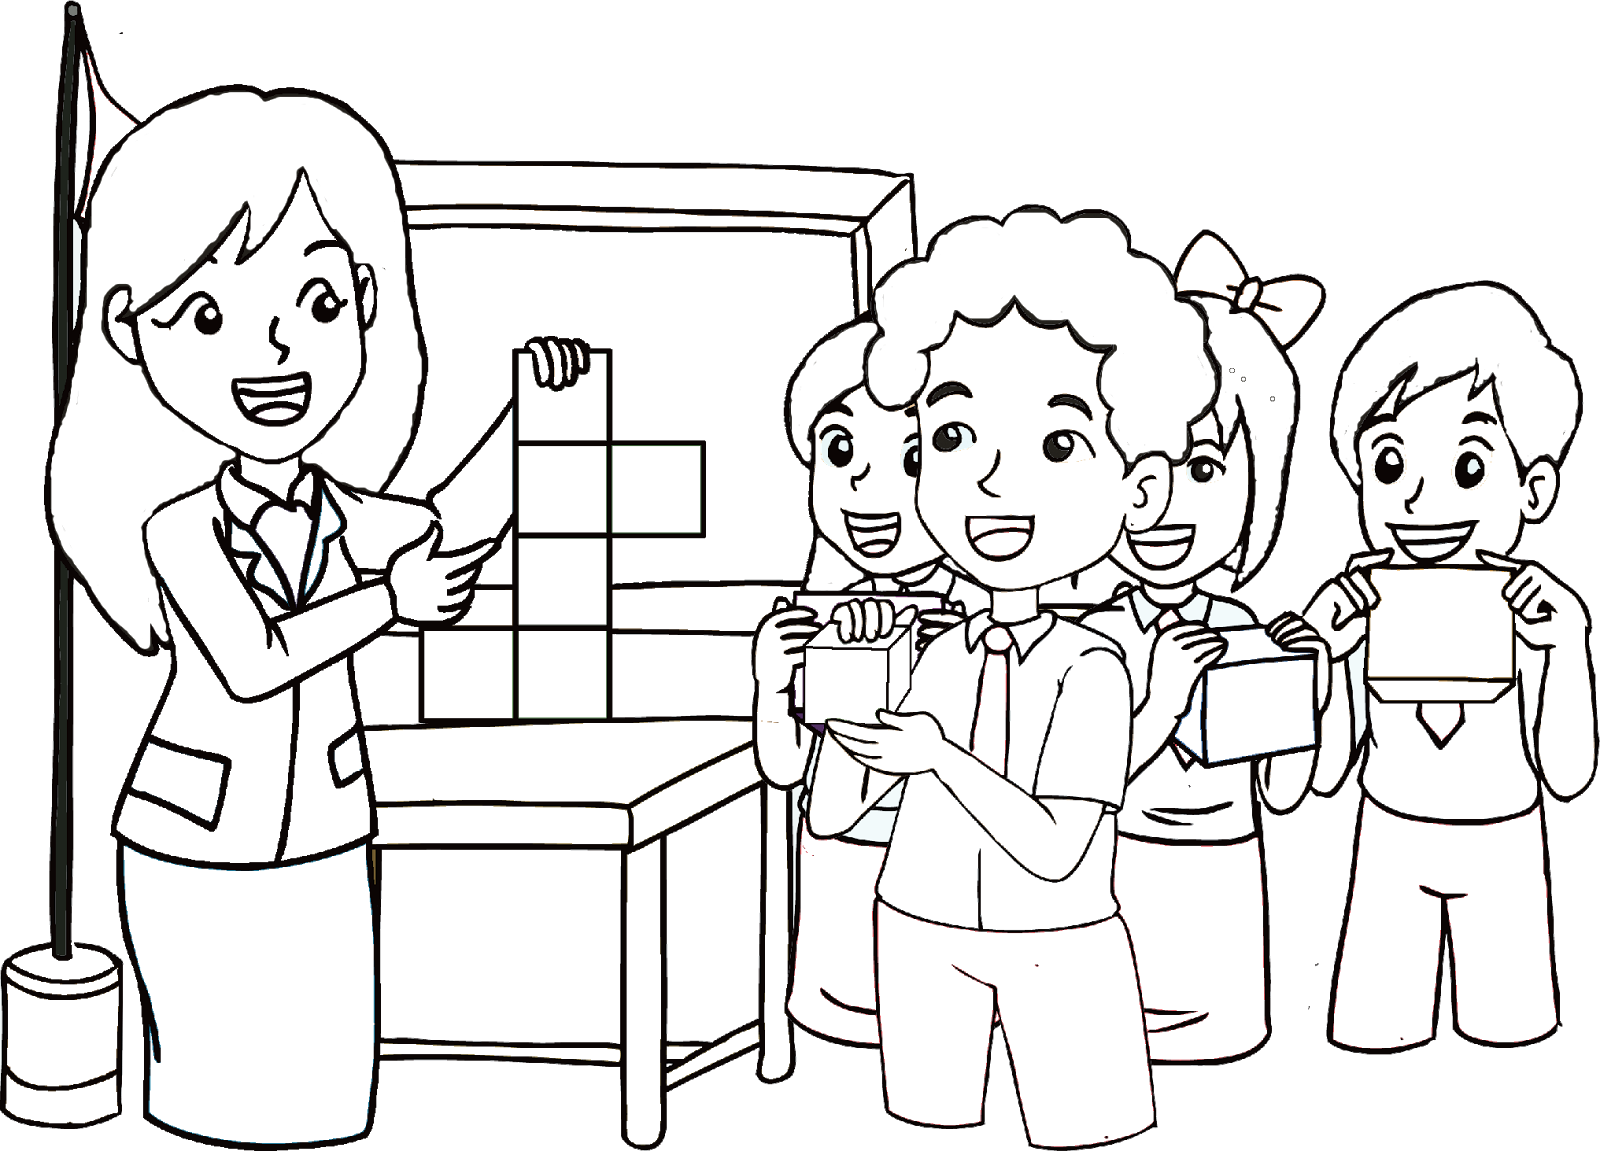 kumpulan gambar hitam putih bw untuk diwarnai freewaremini